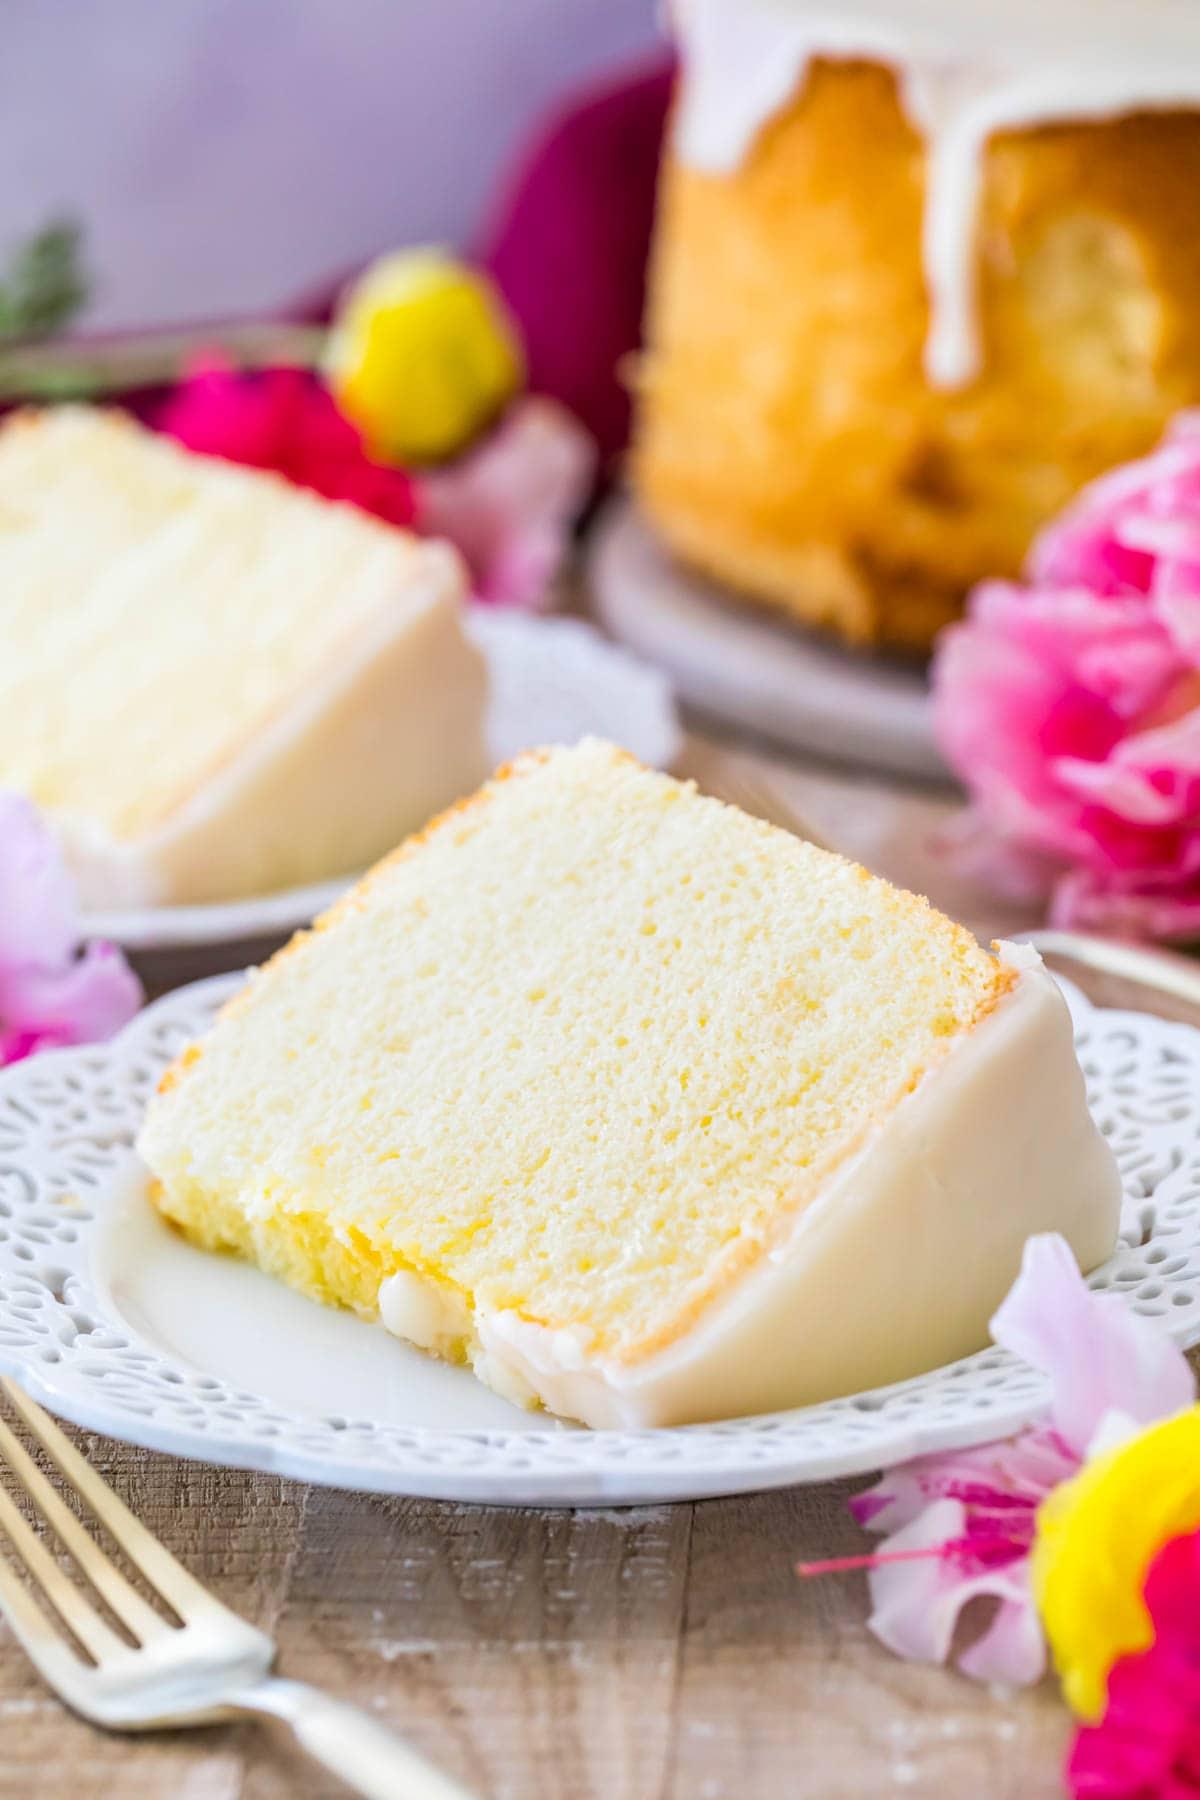 Slice of fluffy chiffon cake on a white plate